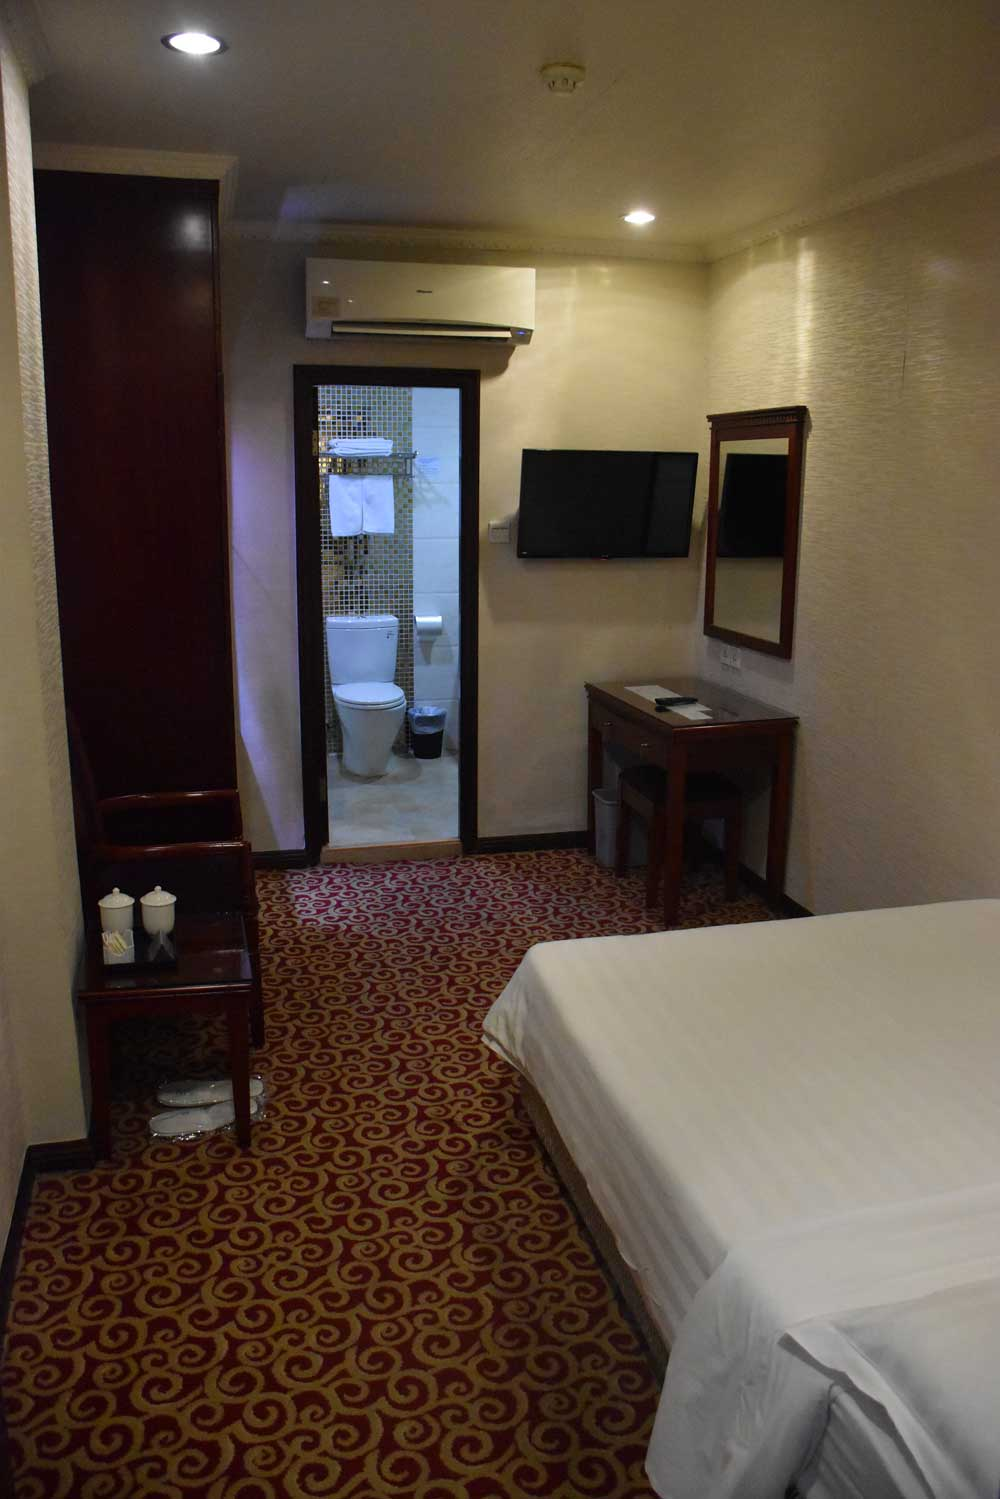 Macau budget hotels: East Asia Hotel